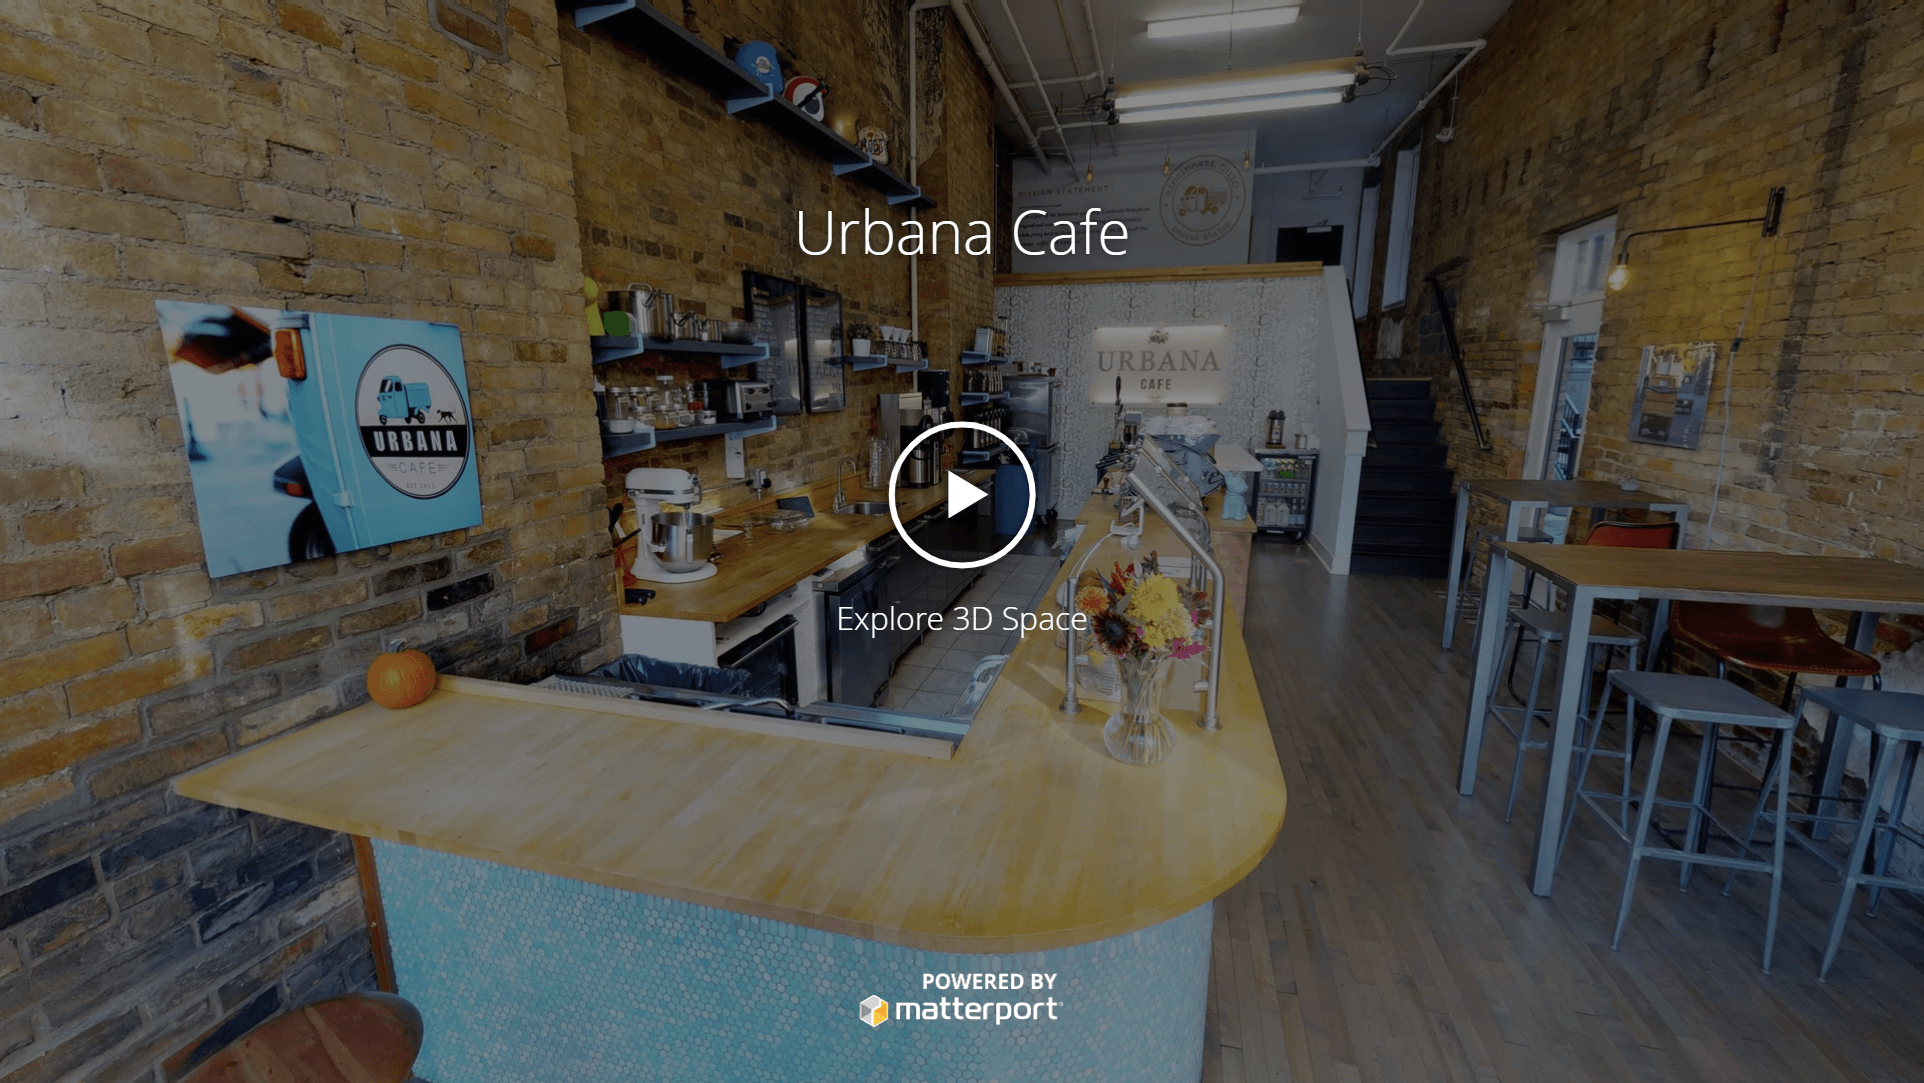 Restaurants & Coffee Bars